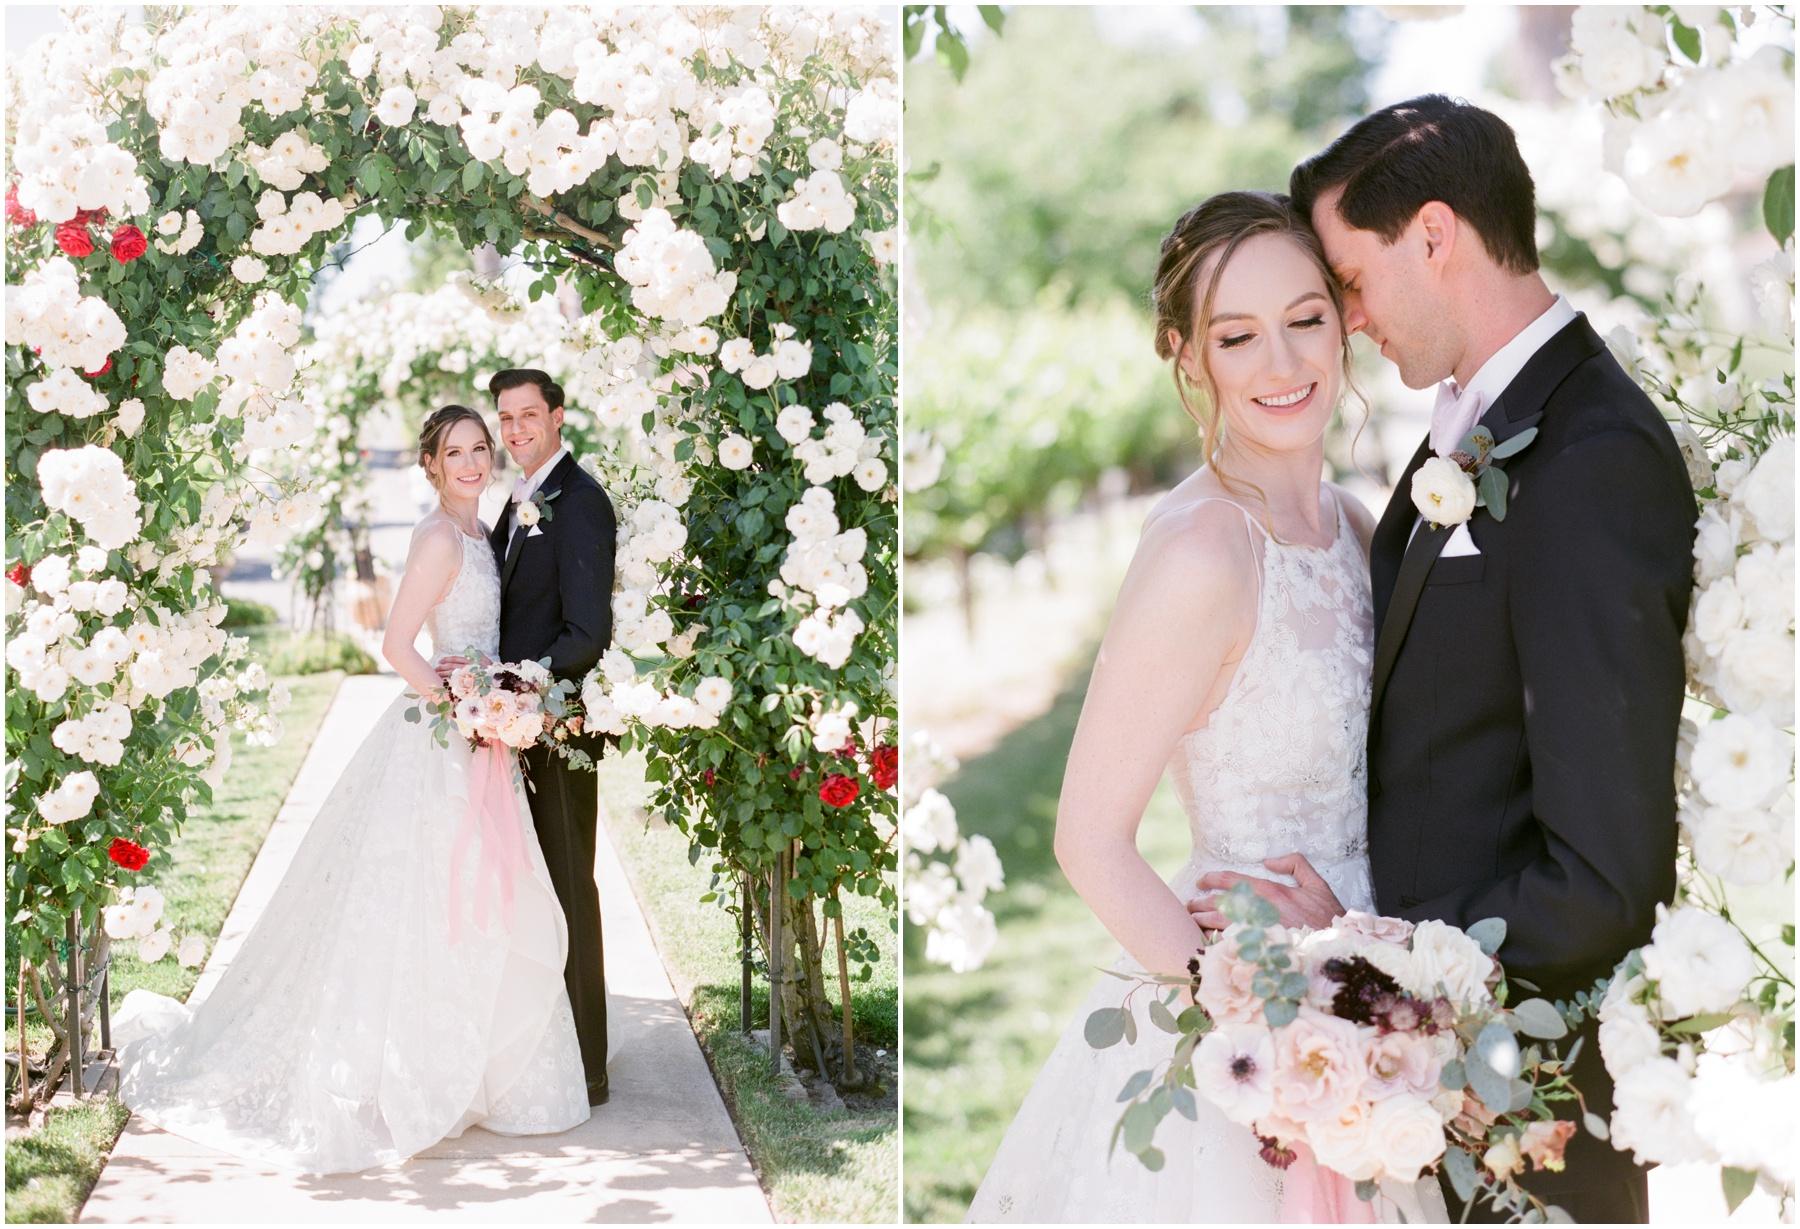 Scribner-bend-vineyards-wedding-sacramento-california-Kristine-Herman-Photography-228.jpg